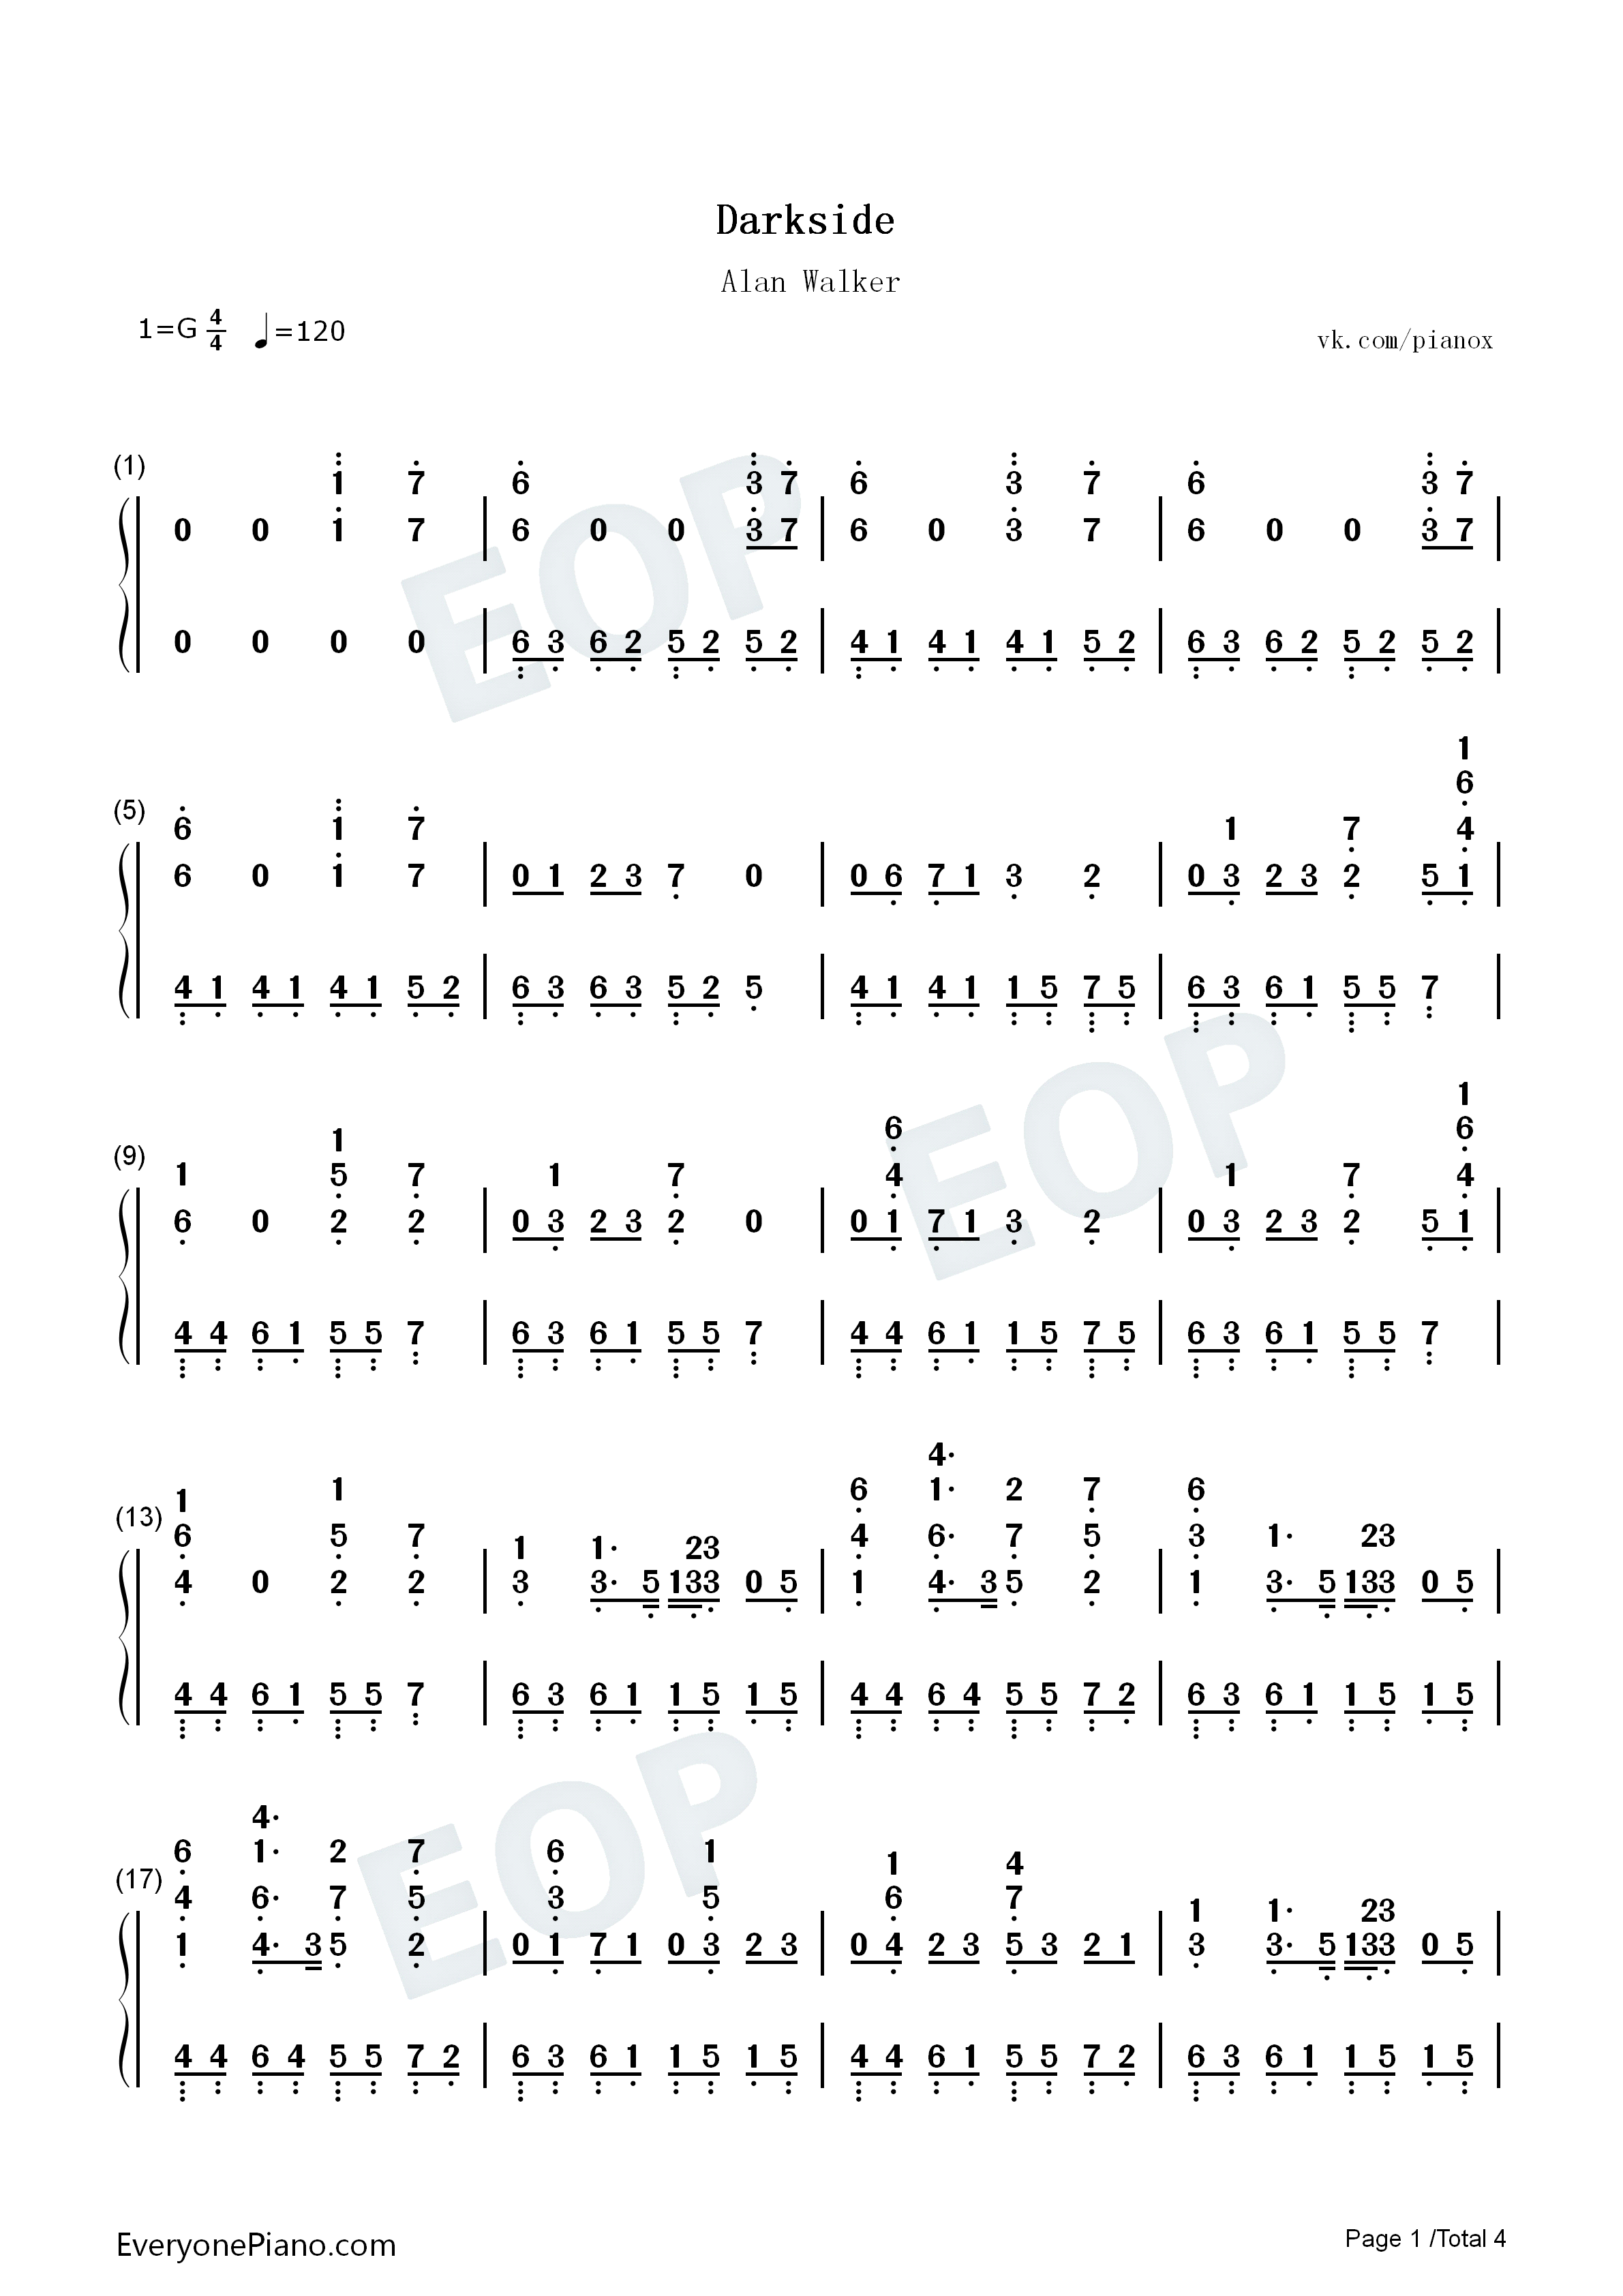 Darkside-Alan Walker Numbered Musical Notation Preview